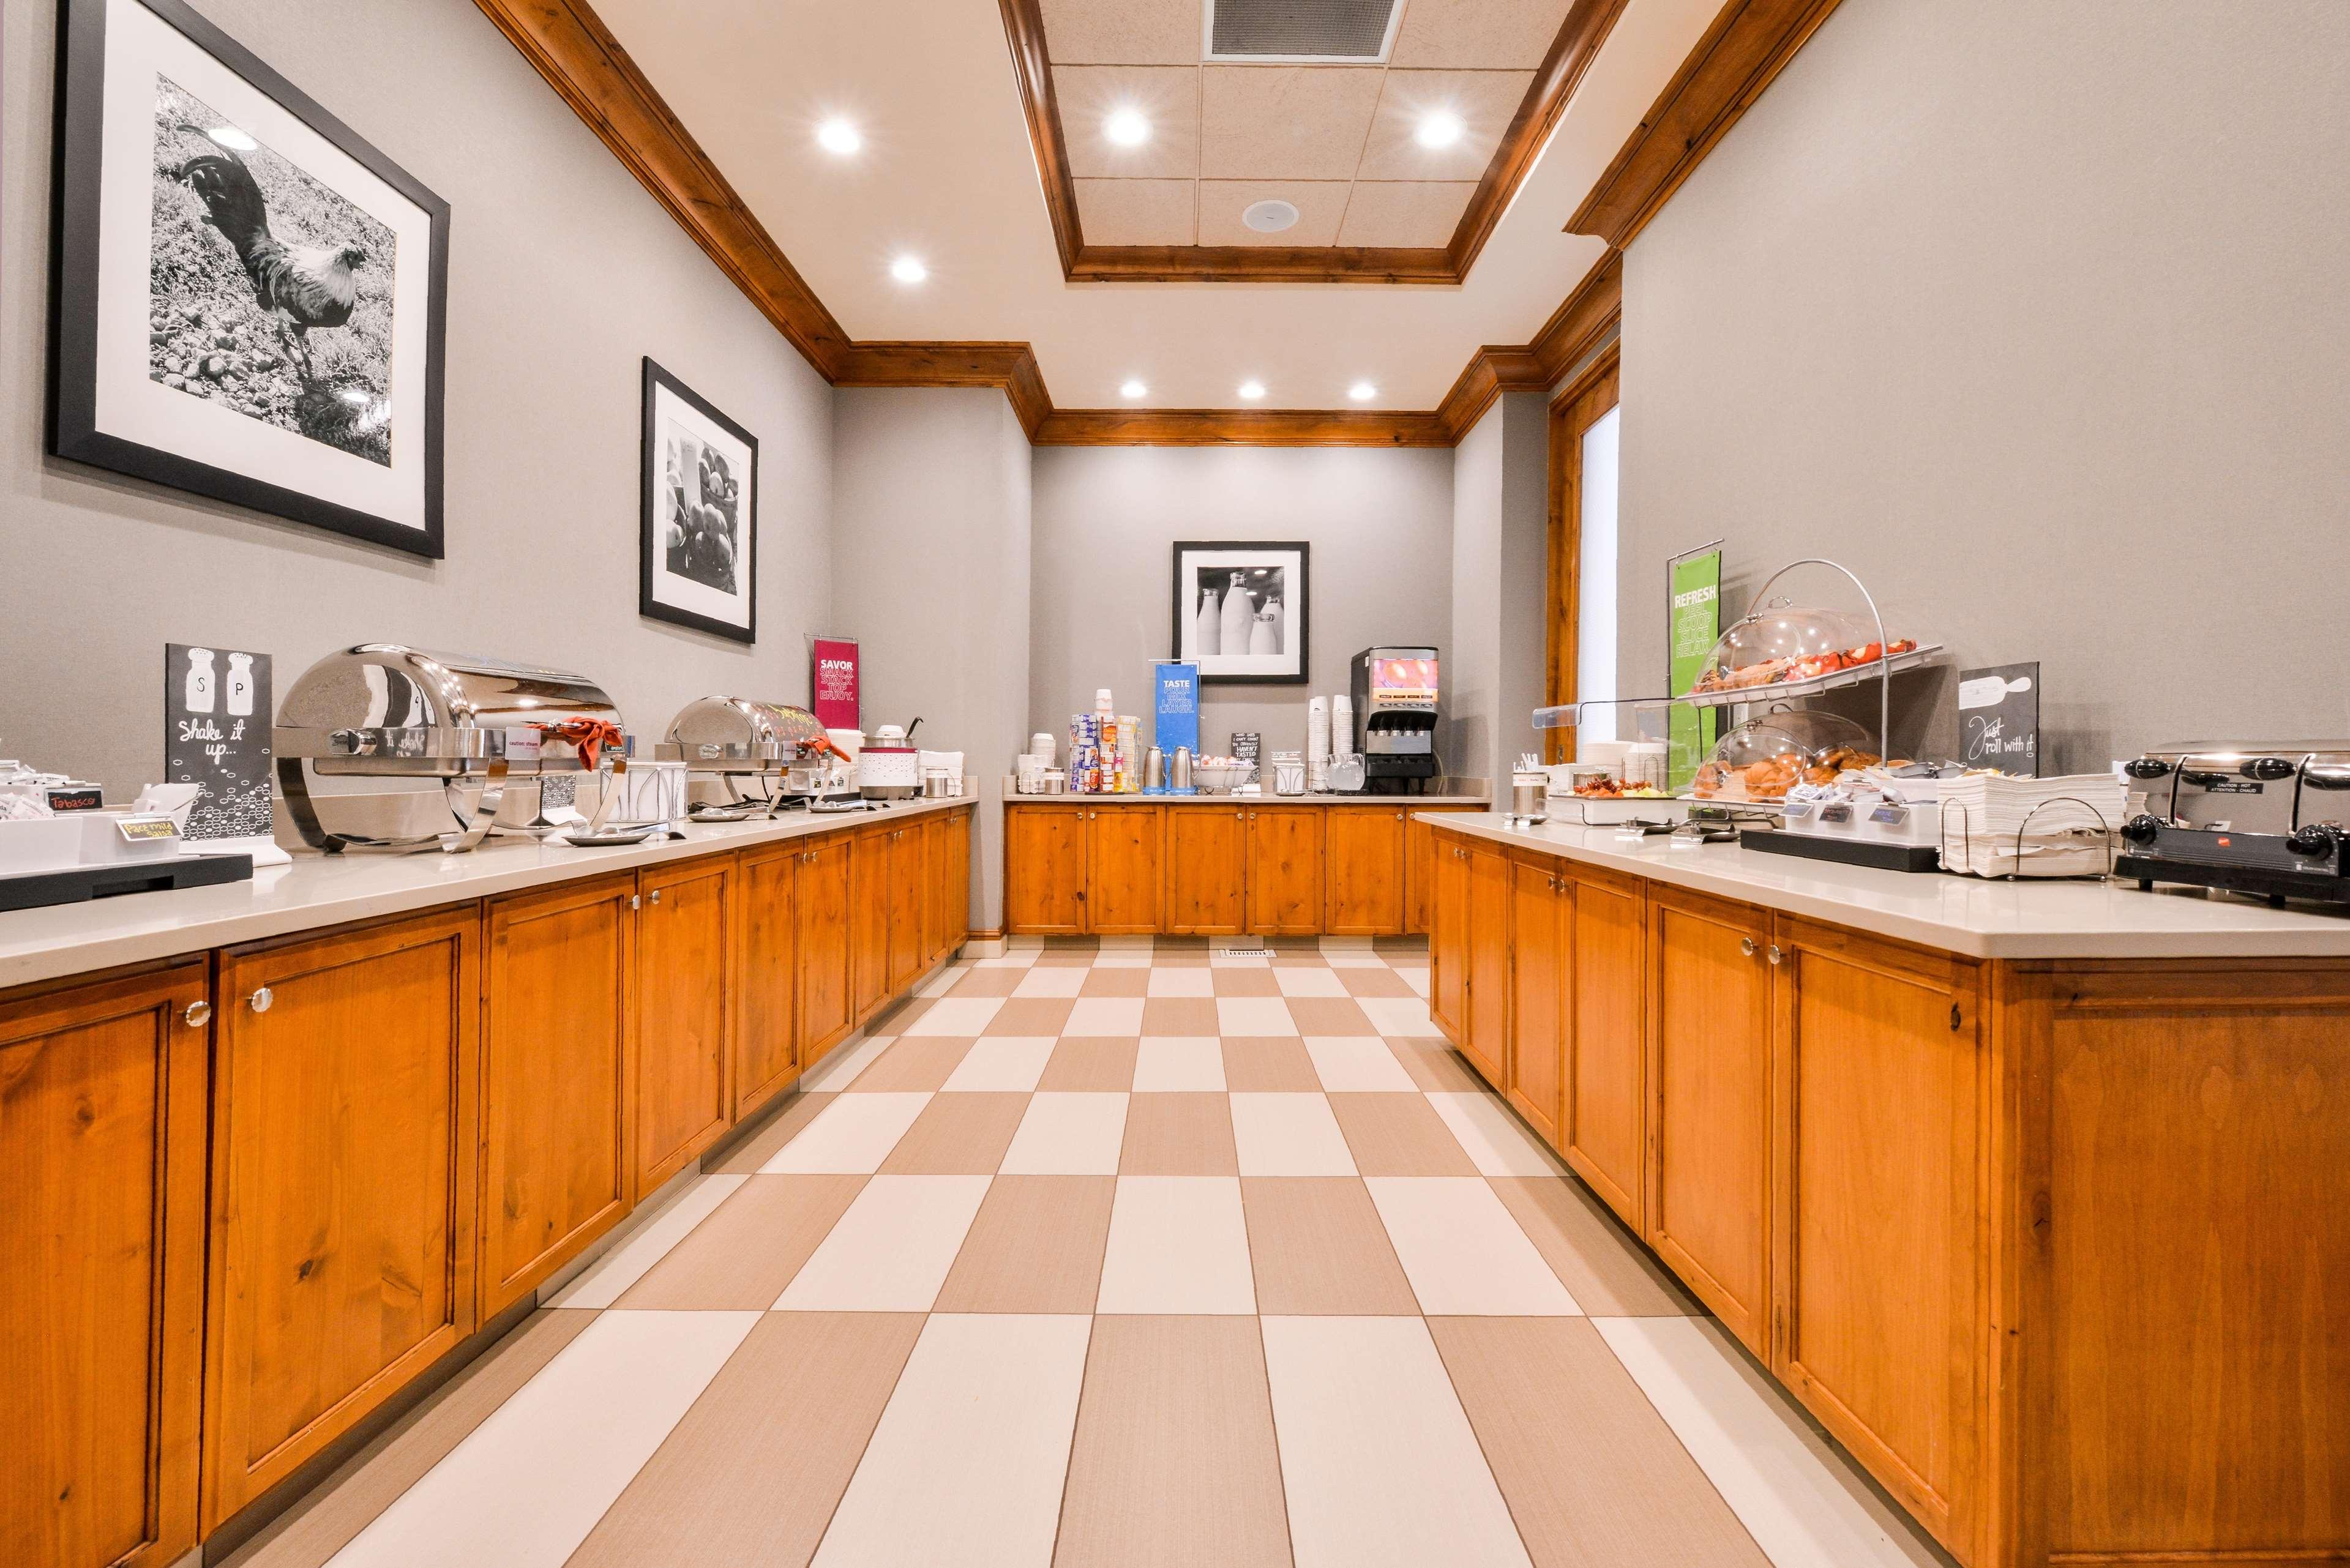 Hampton Inn & Suites Coeur d' Alene image 12